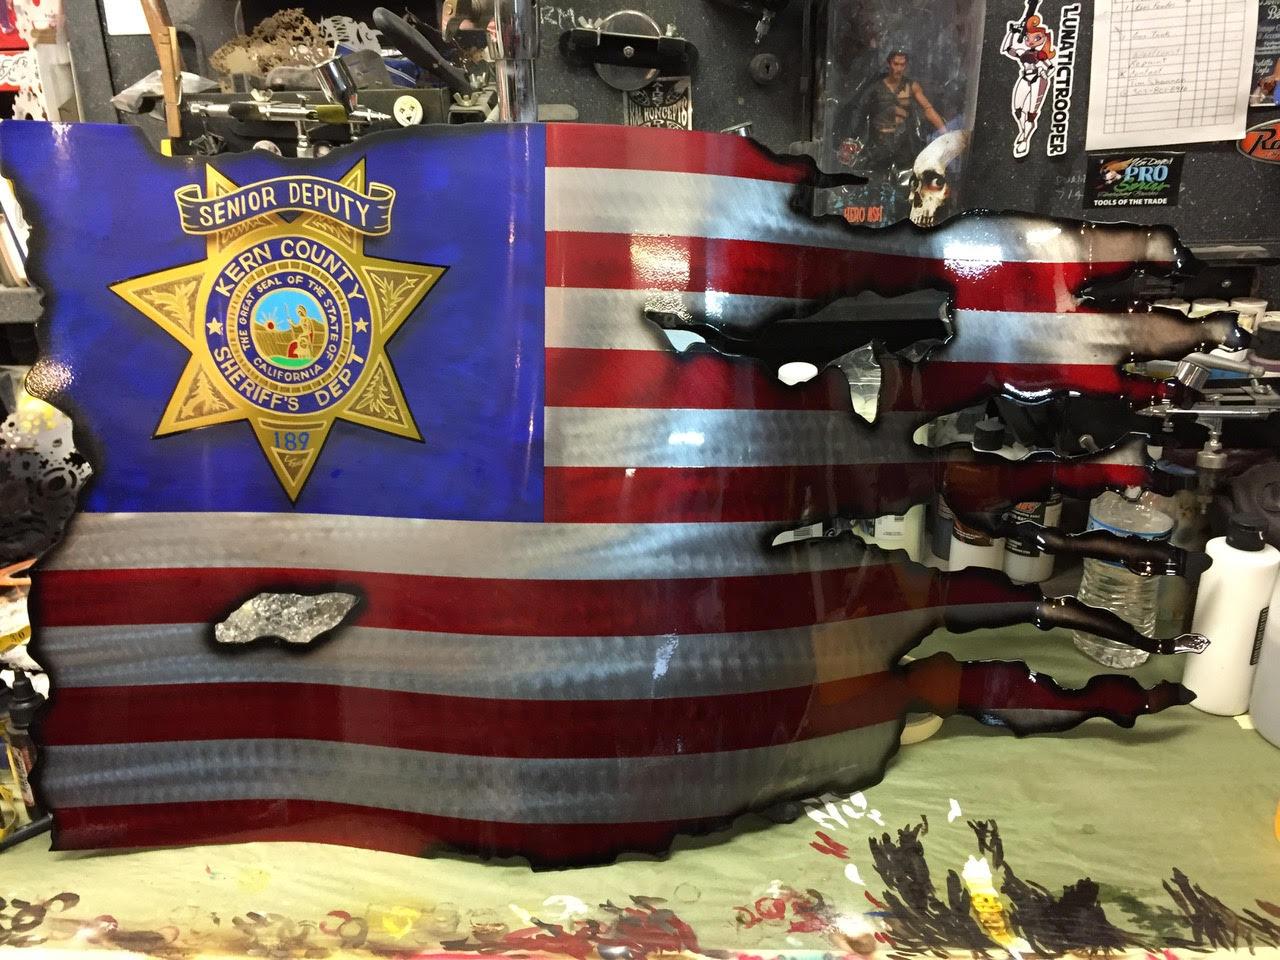 RWB Flag with Police Shield